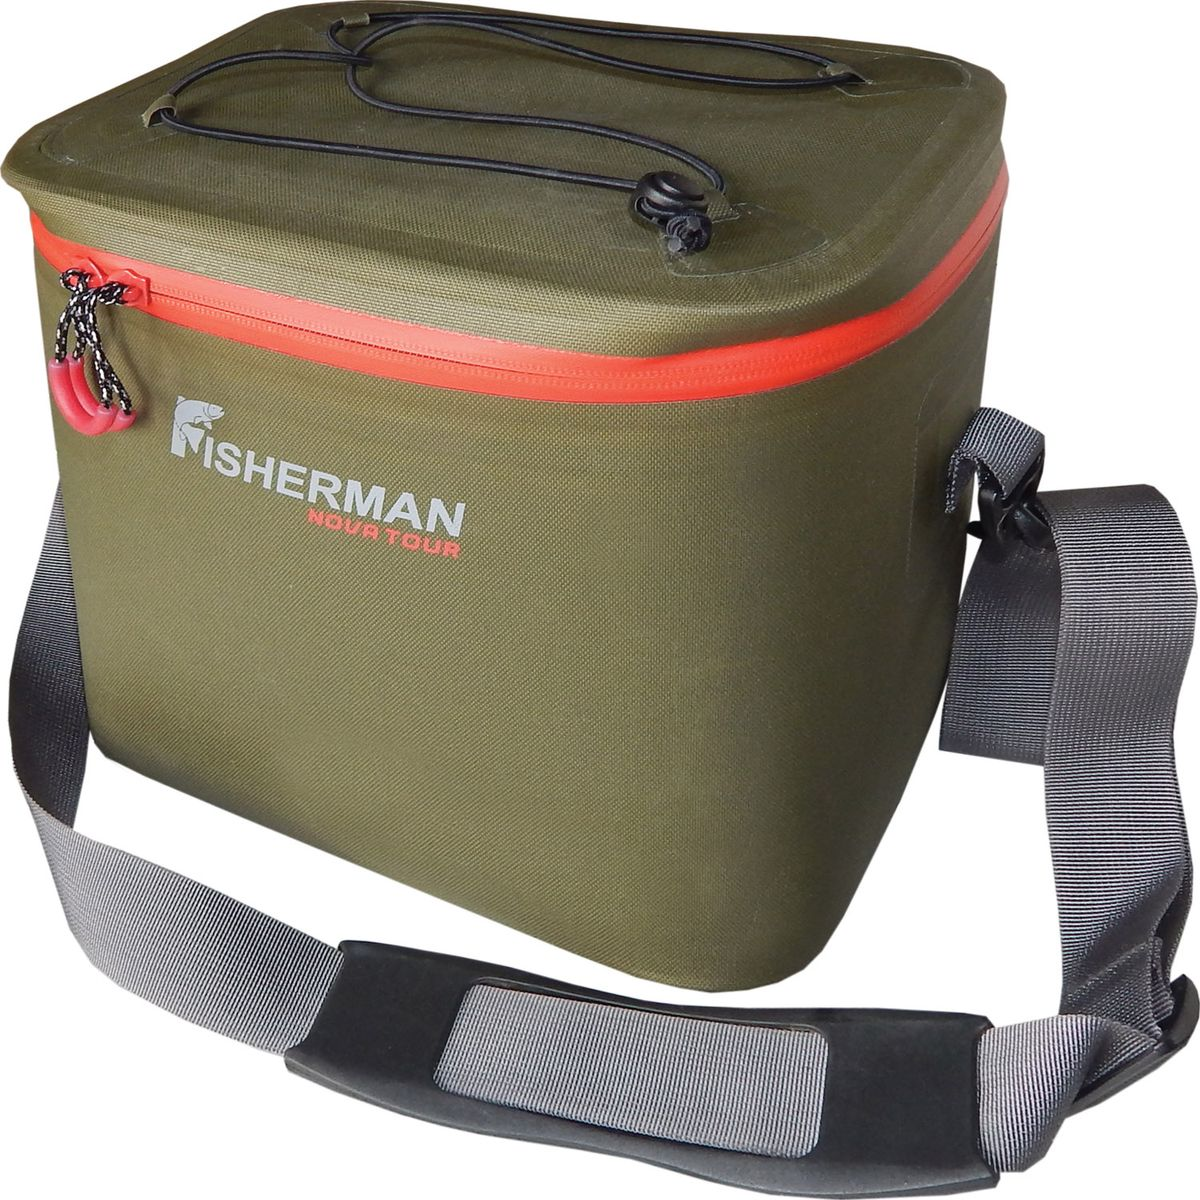 Сумка Fisherman Nova Tour Кейс PRO, цвет: хаки, 14 л сумки nova tour сумка